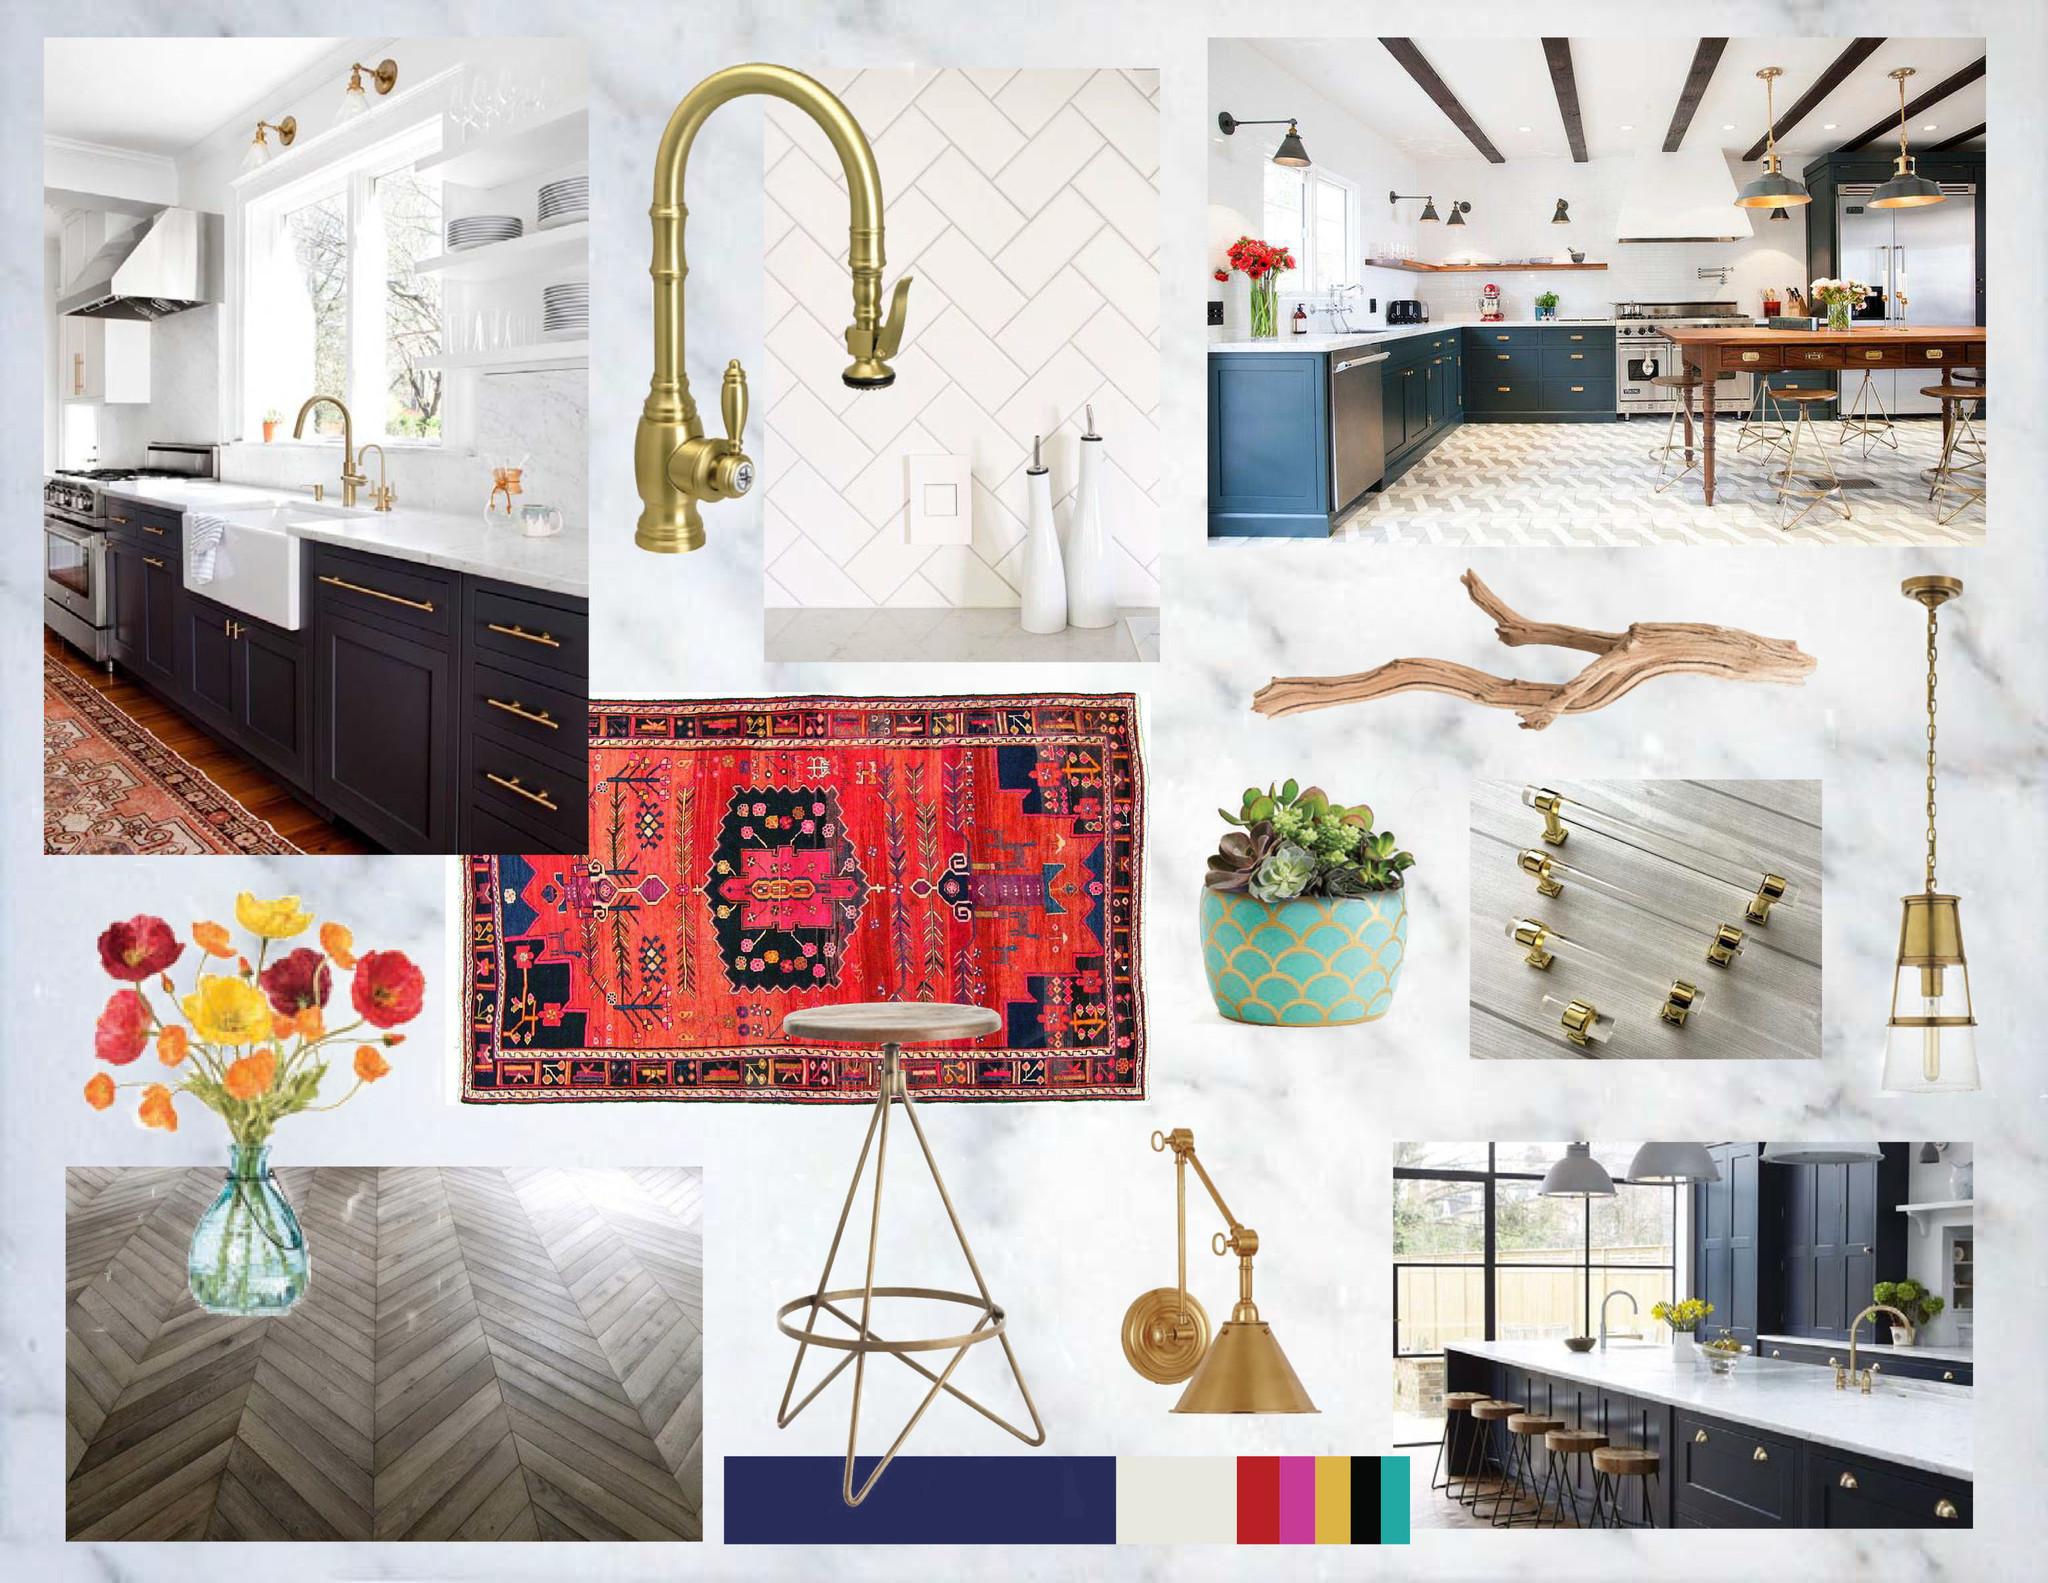 Kitchen by Samantha Williams, principal at Ederra Design Studio.